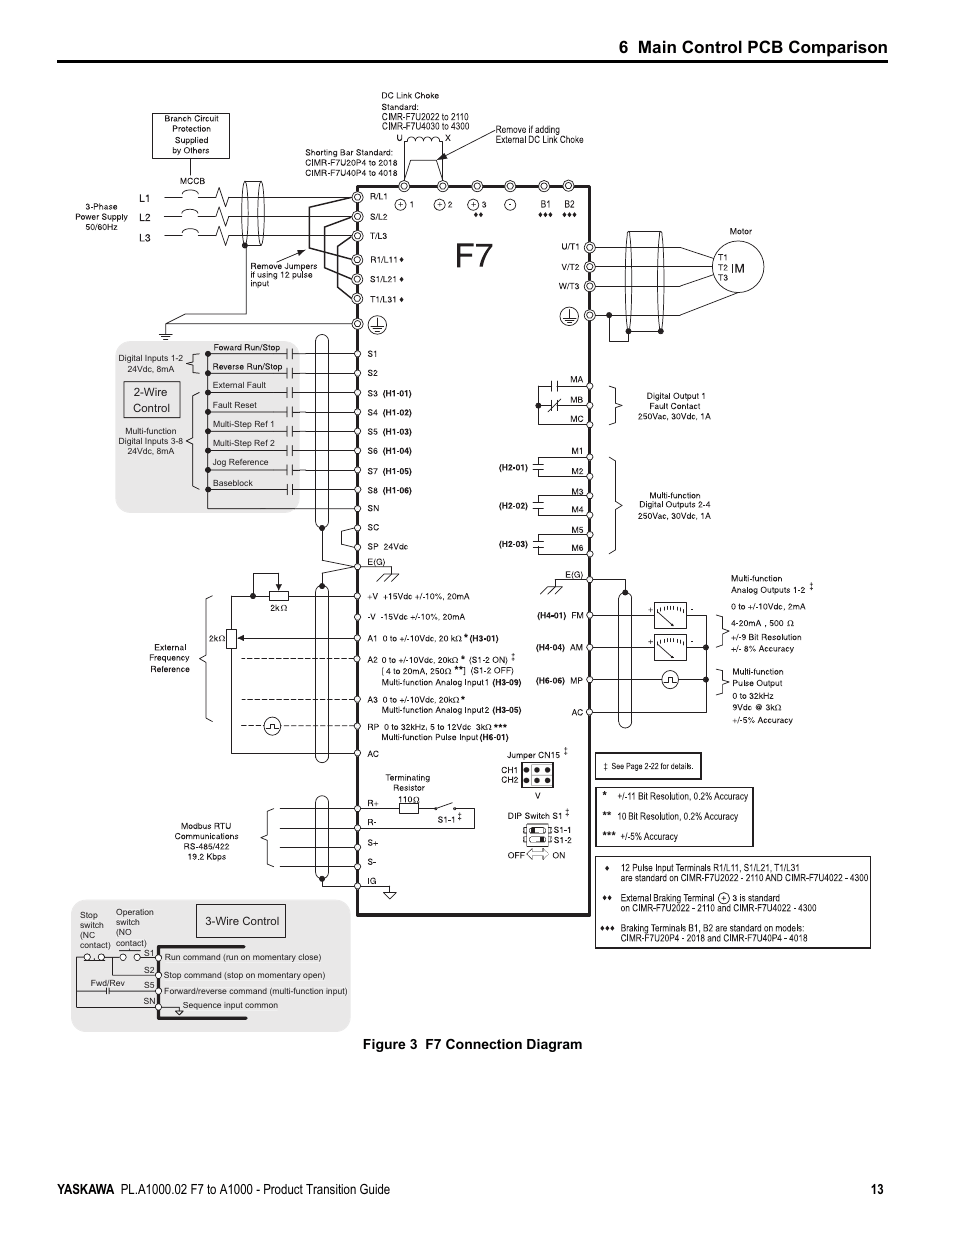 yaskawa varispeed f7 wiring diagram